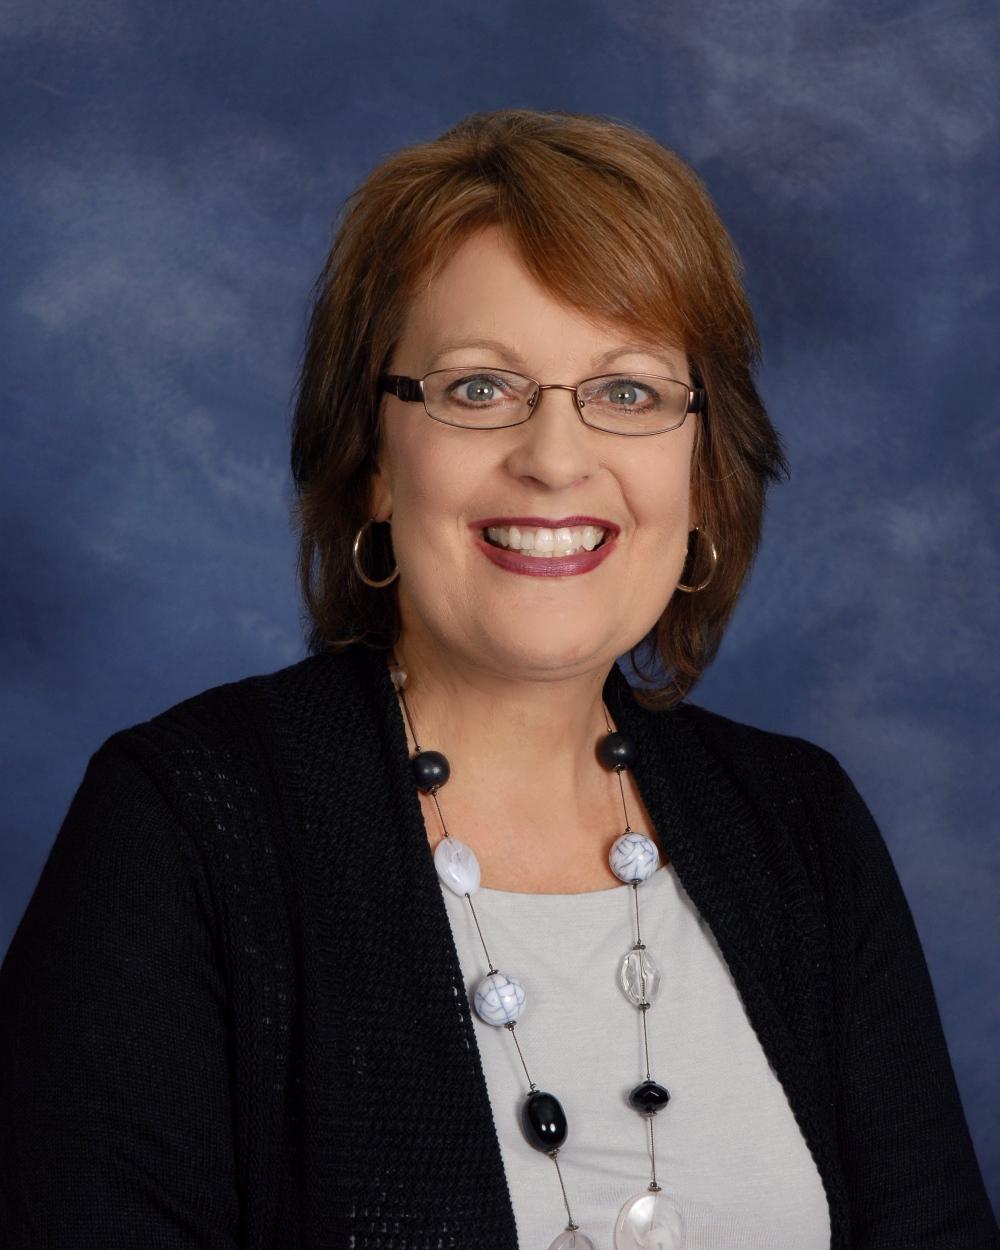 Melody Fugate, Secretary